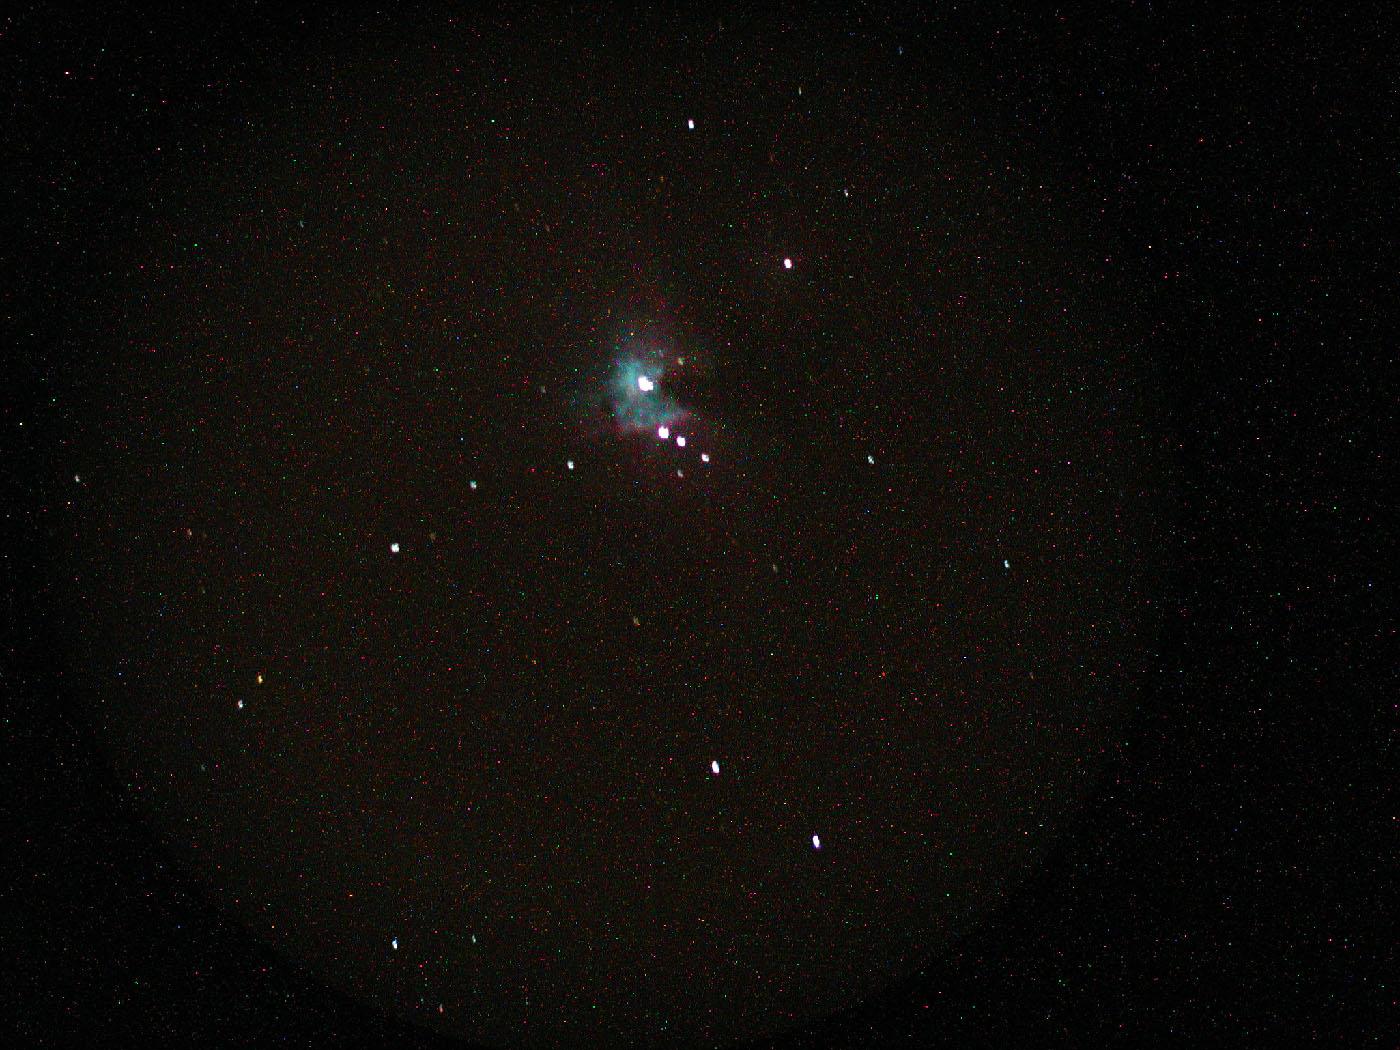 from small telescope orion nebula - photo #23